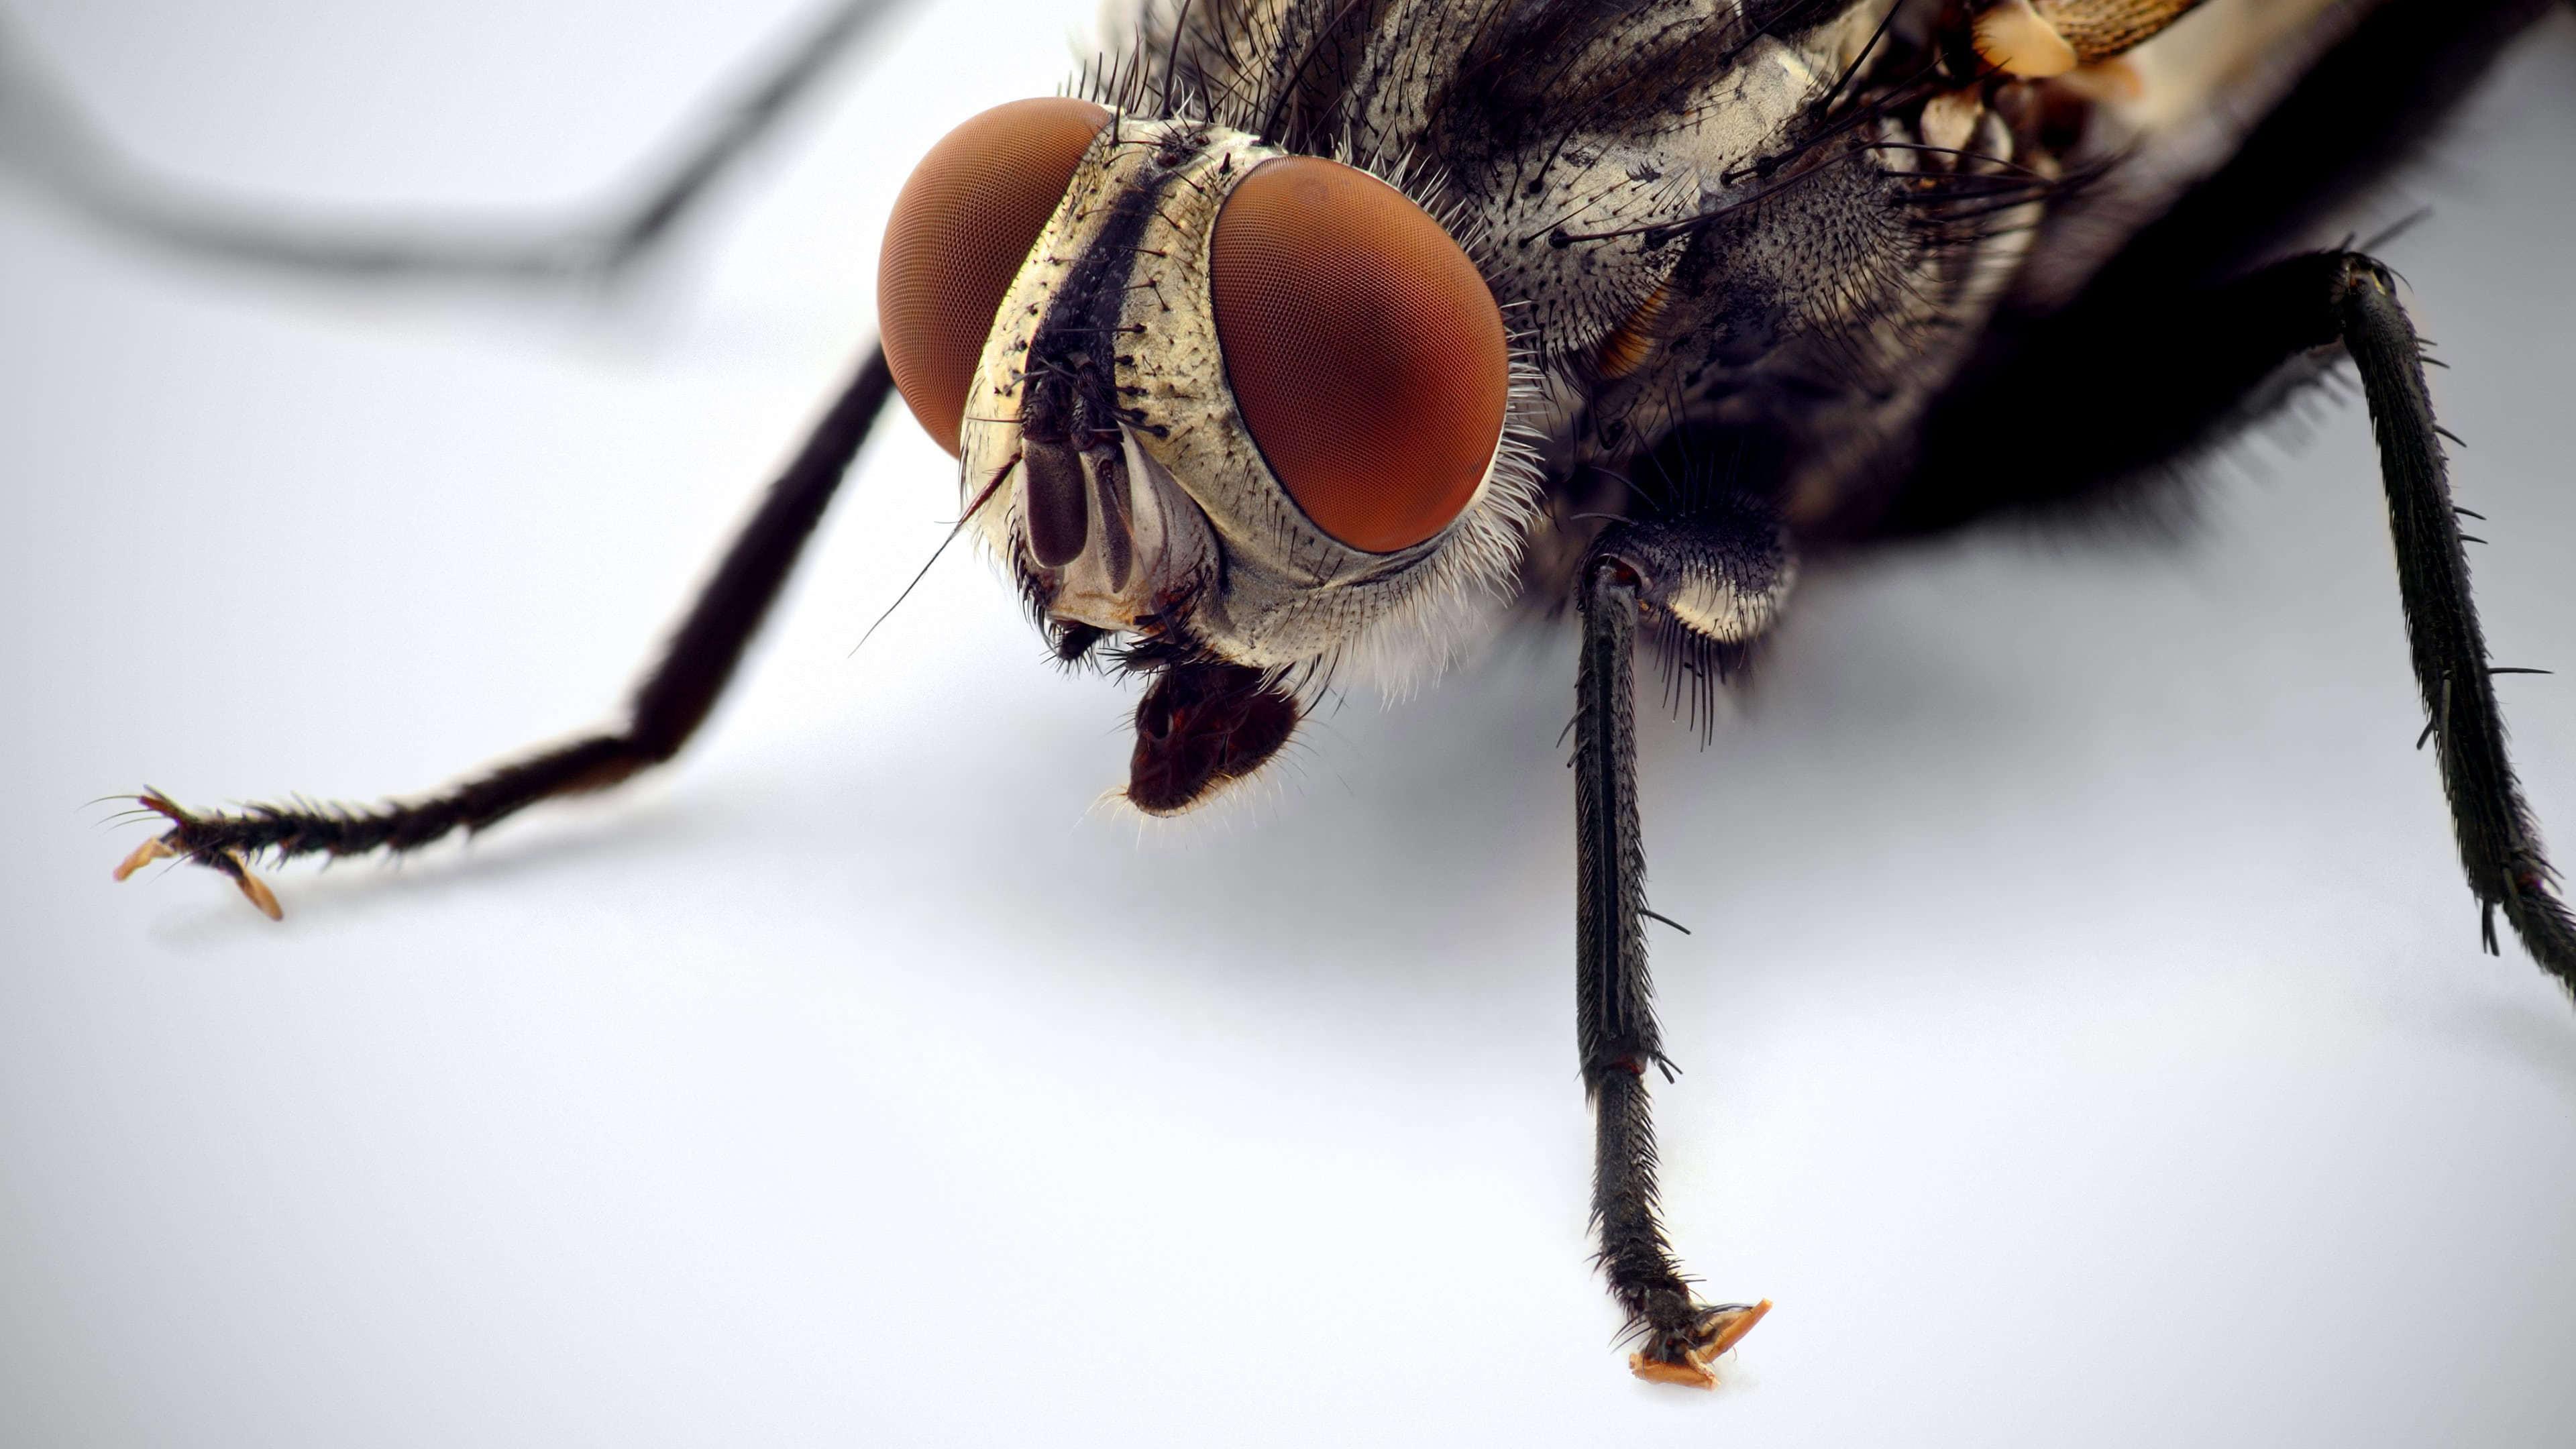 fly macro uhd 4k wallpaper